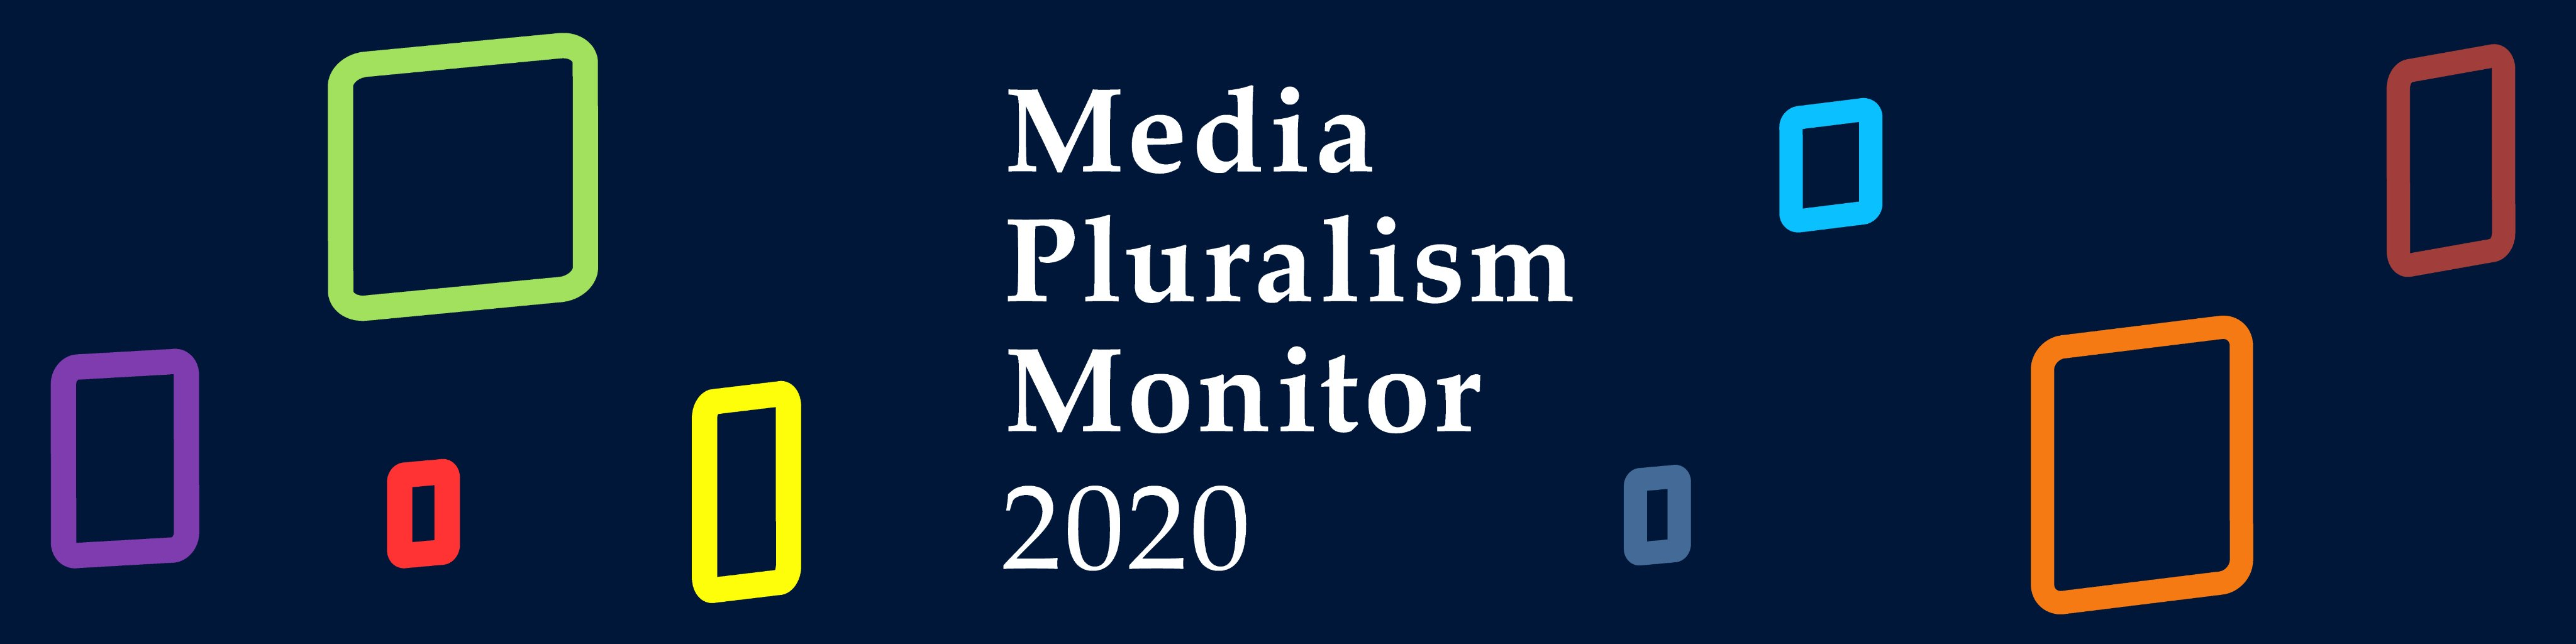 Media Pluralism Monitor 2020